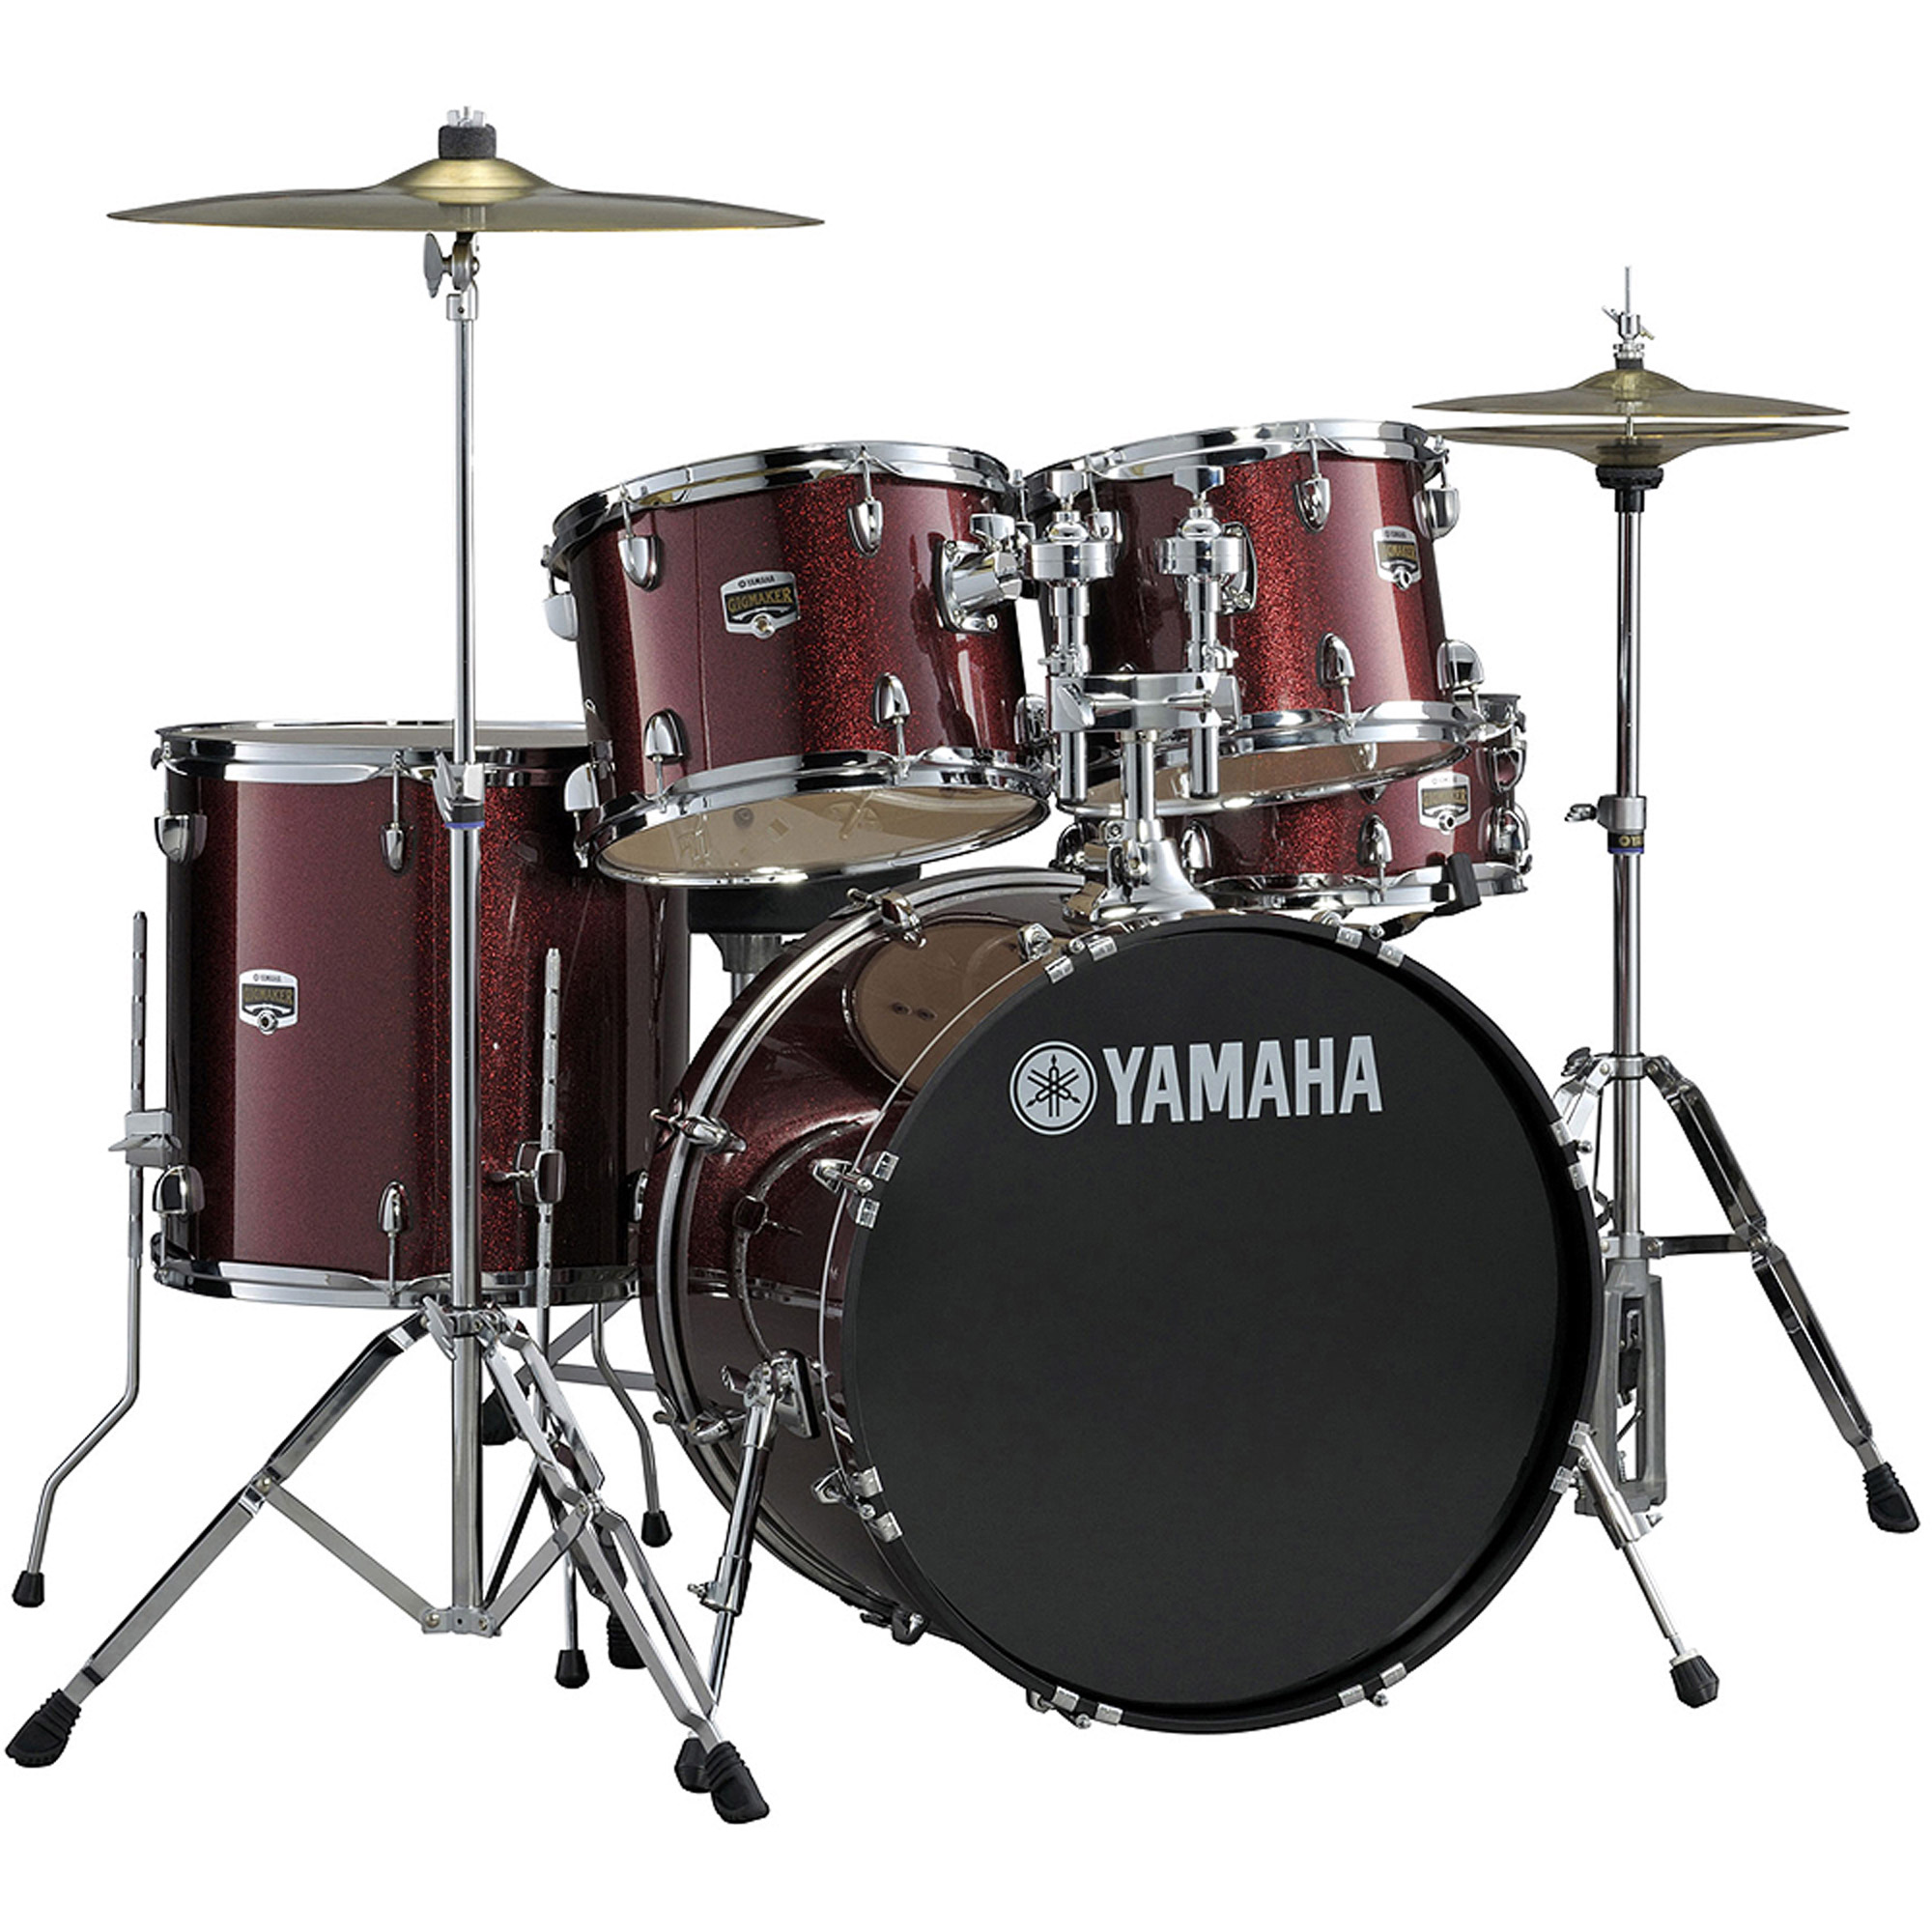 Yamaha GM2F56BGG Gigmaker Standard 5-Piece Drum Set with Hardware, Burgundy Glitter